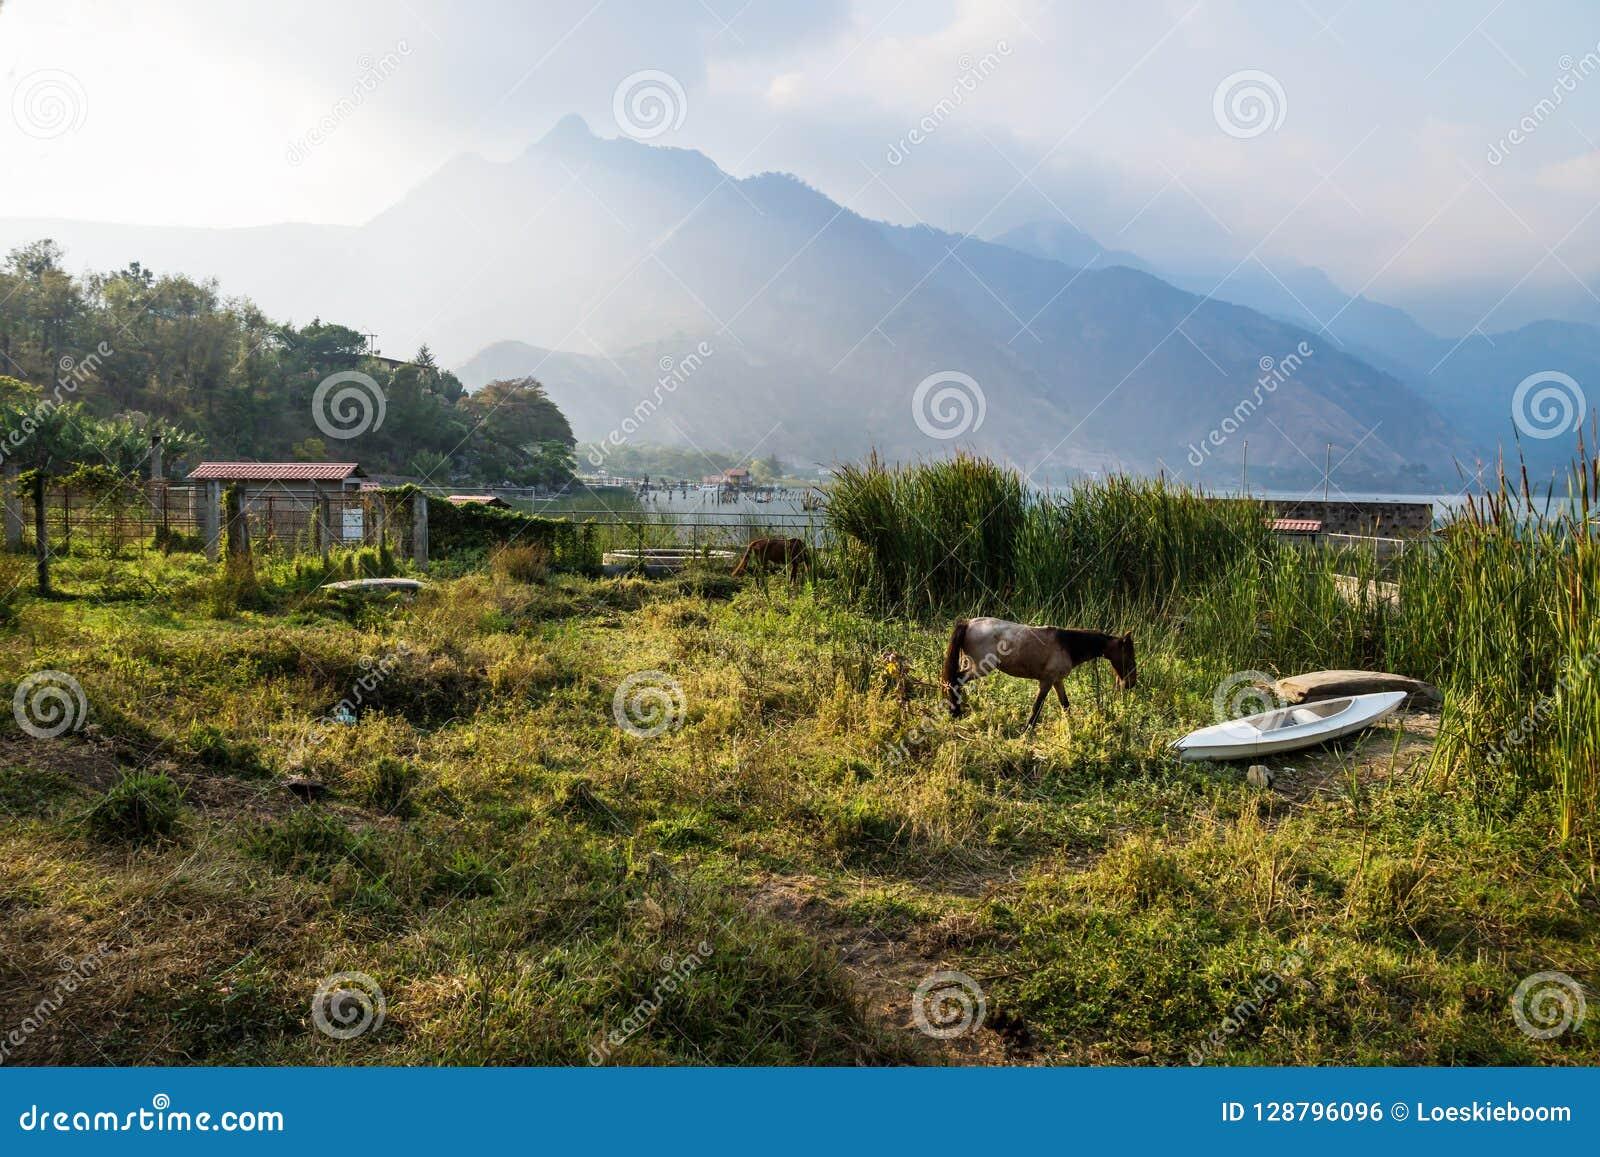 Horse and a canoe on a meadow along Lago Atitlan with mountainrange, San Juan la Laguna, Guatemala, Central America